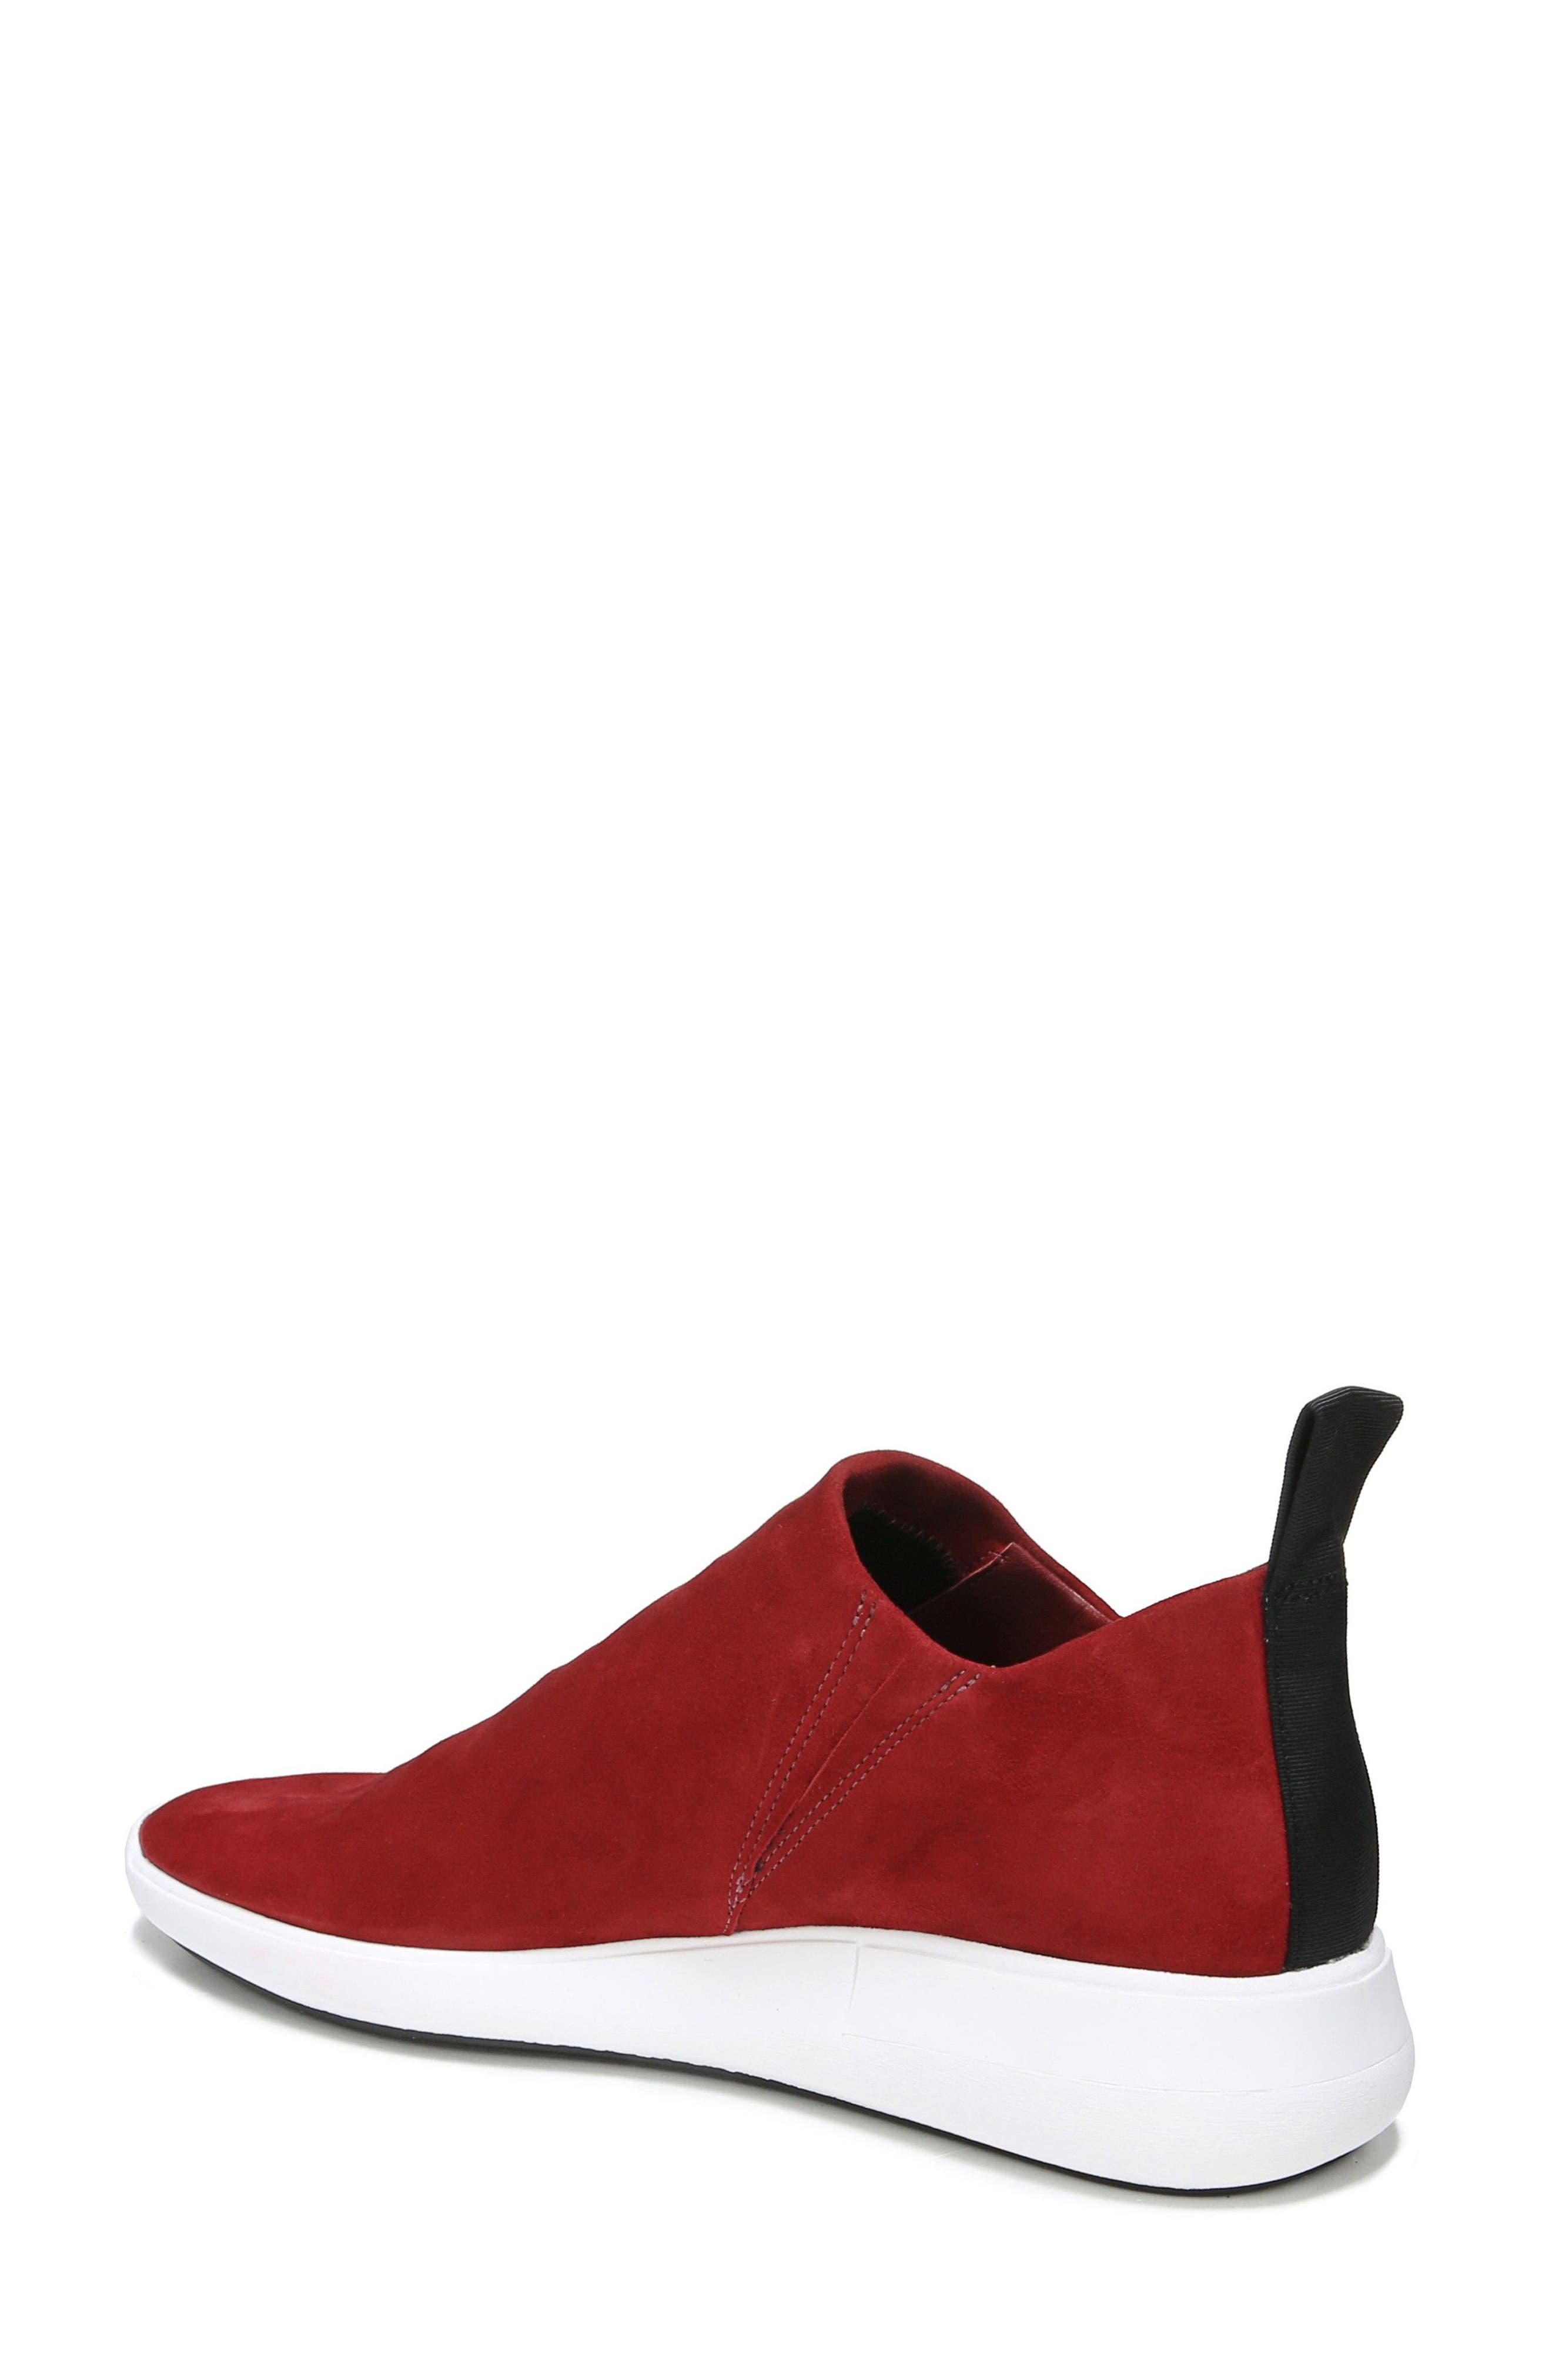 Marlow Slip-On Sneaker,                             Alternate thumbnail 2, color,                             Ruby Suede